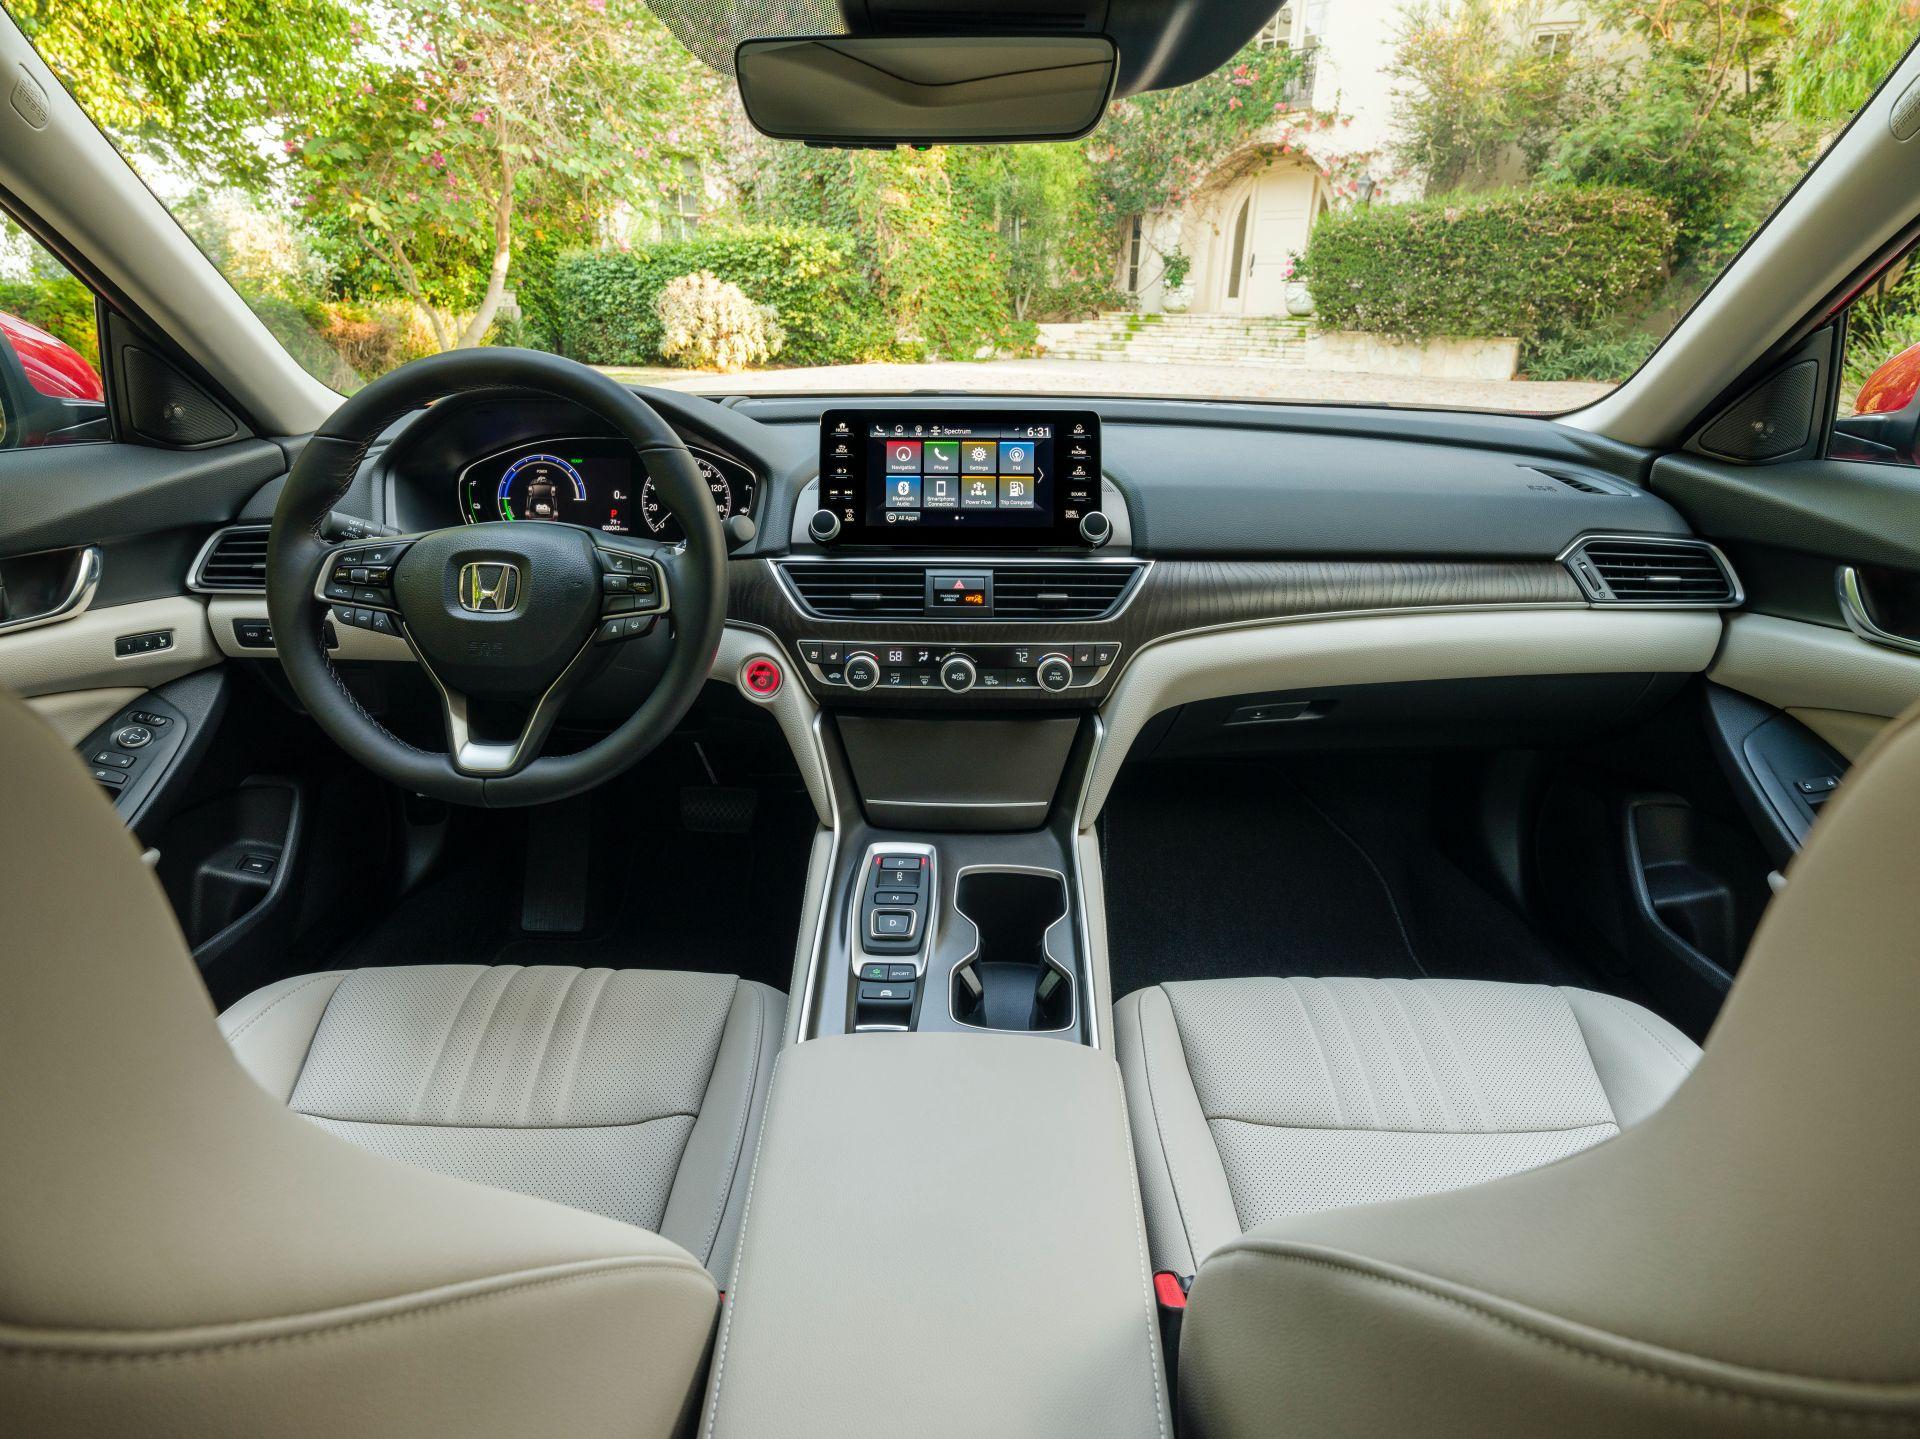 2021-honda-accord-hybrid-13.jpg